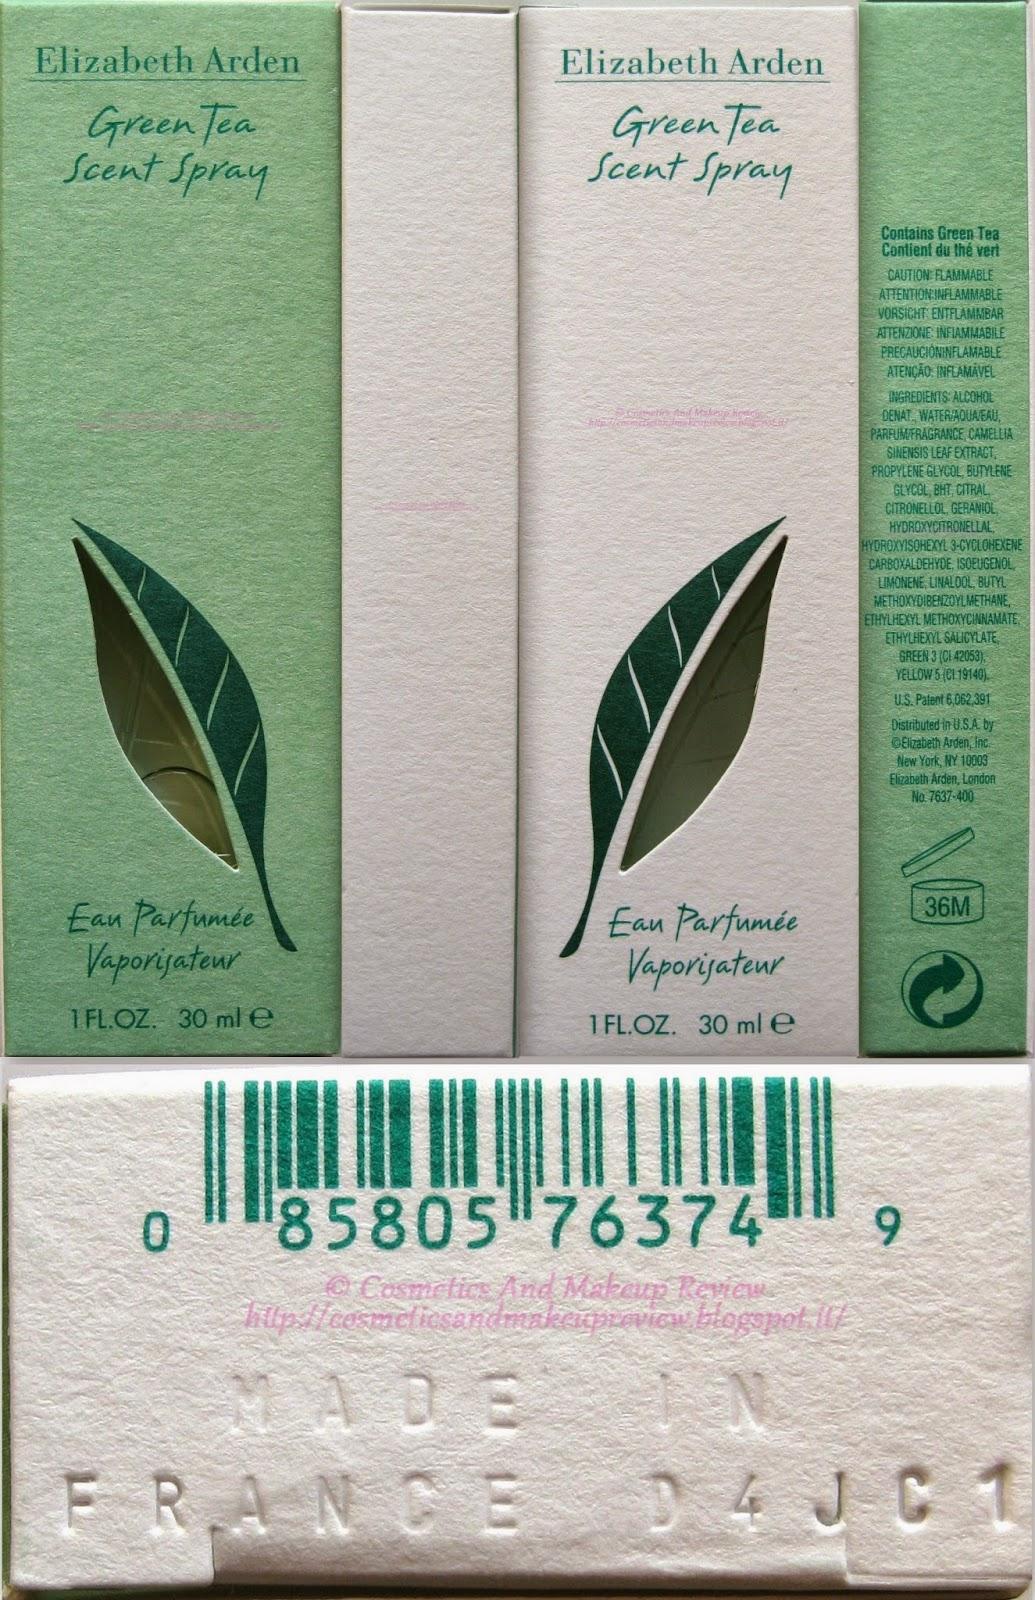 Elizabeth Arden - Green Tea Scent Spray - Eau Parfumée Vaporisateur - confezione